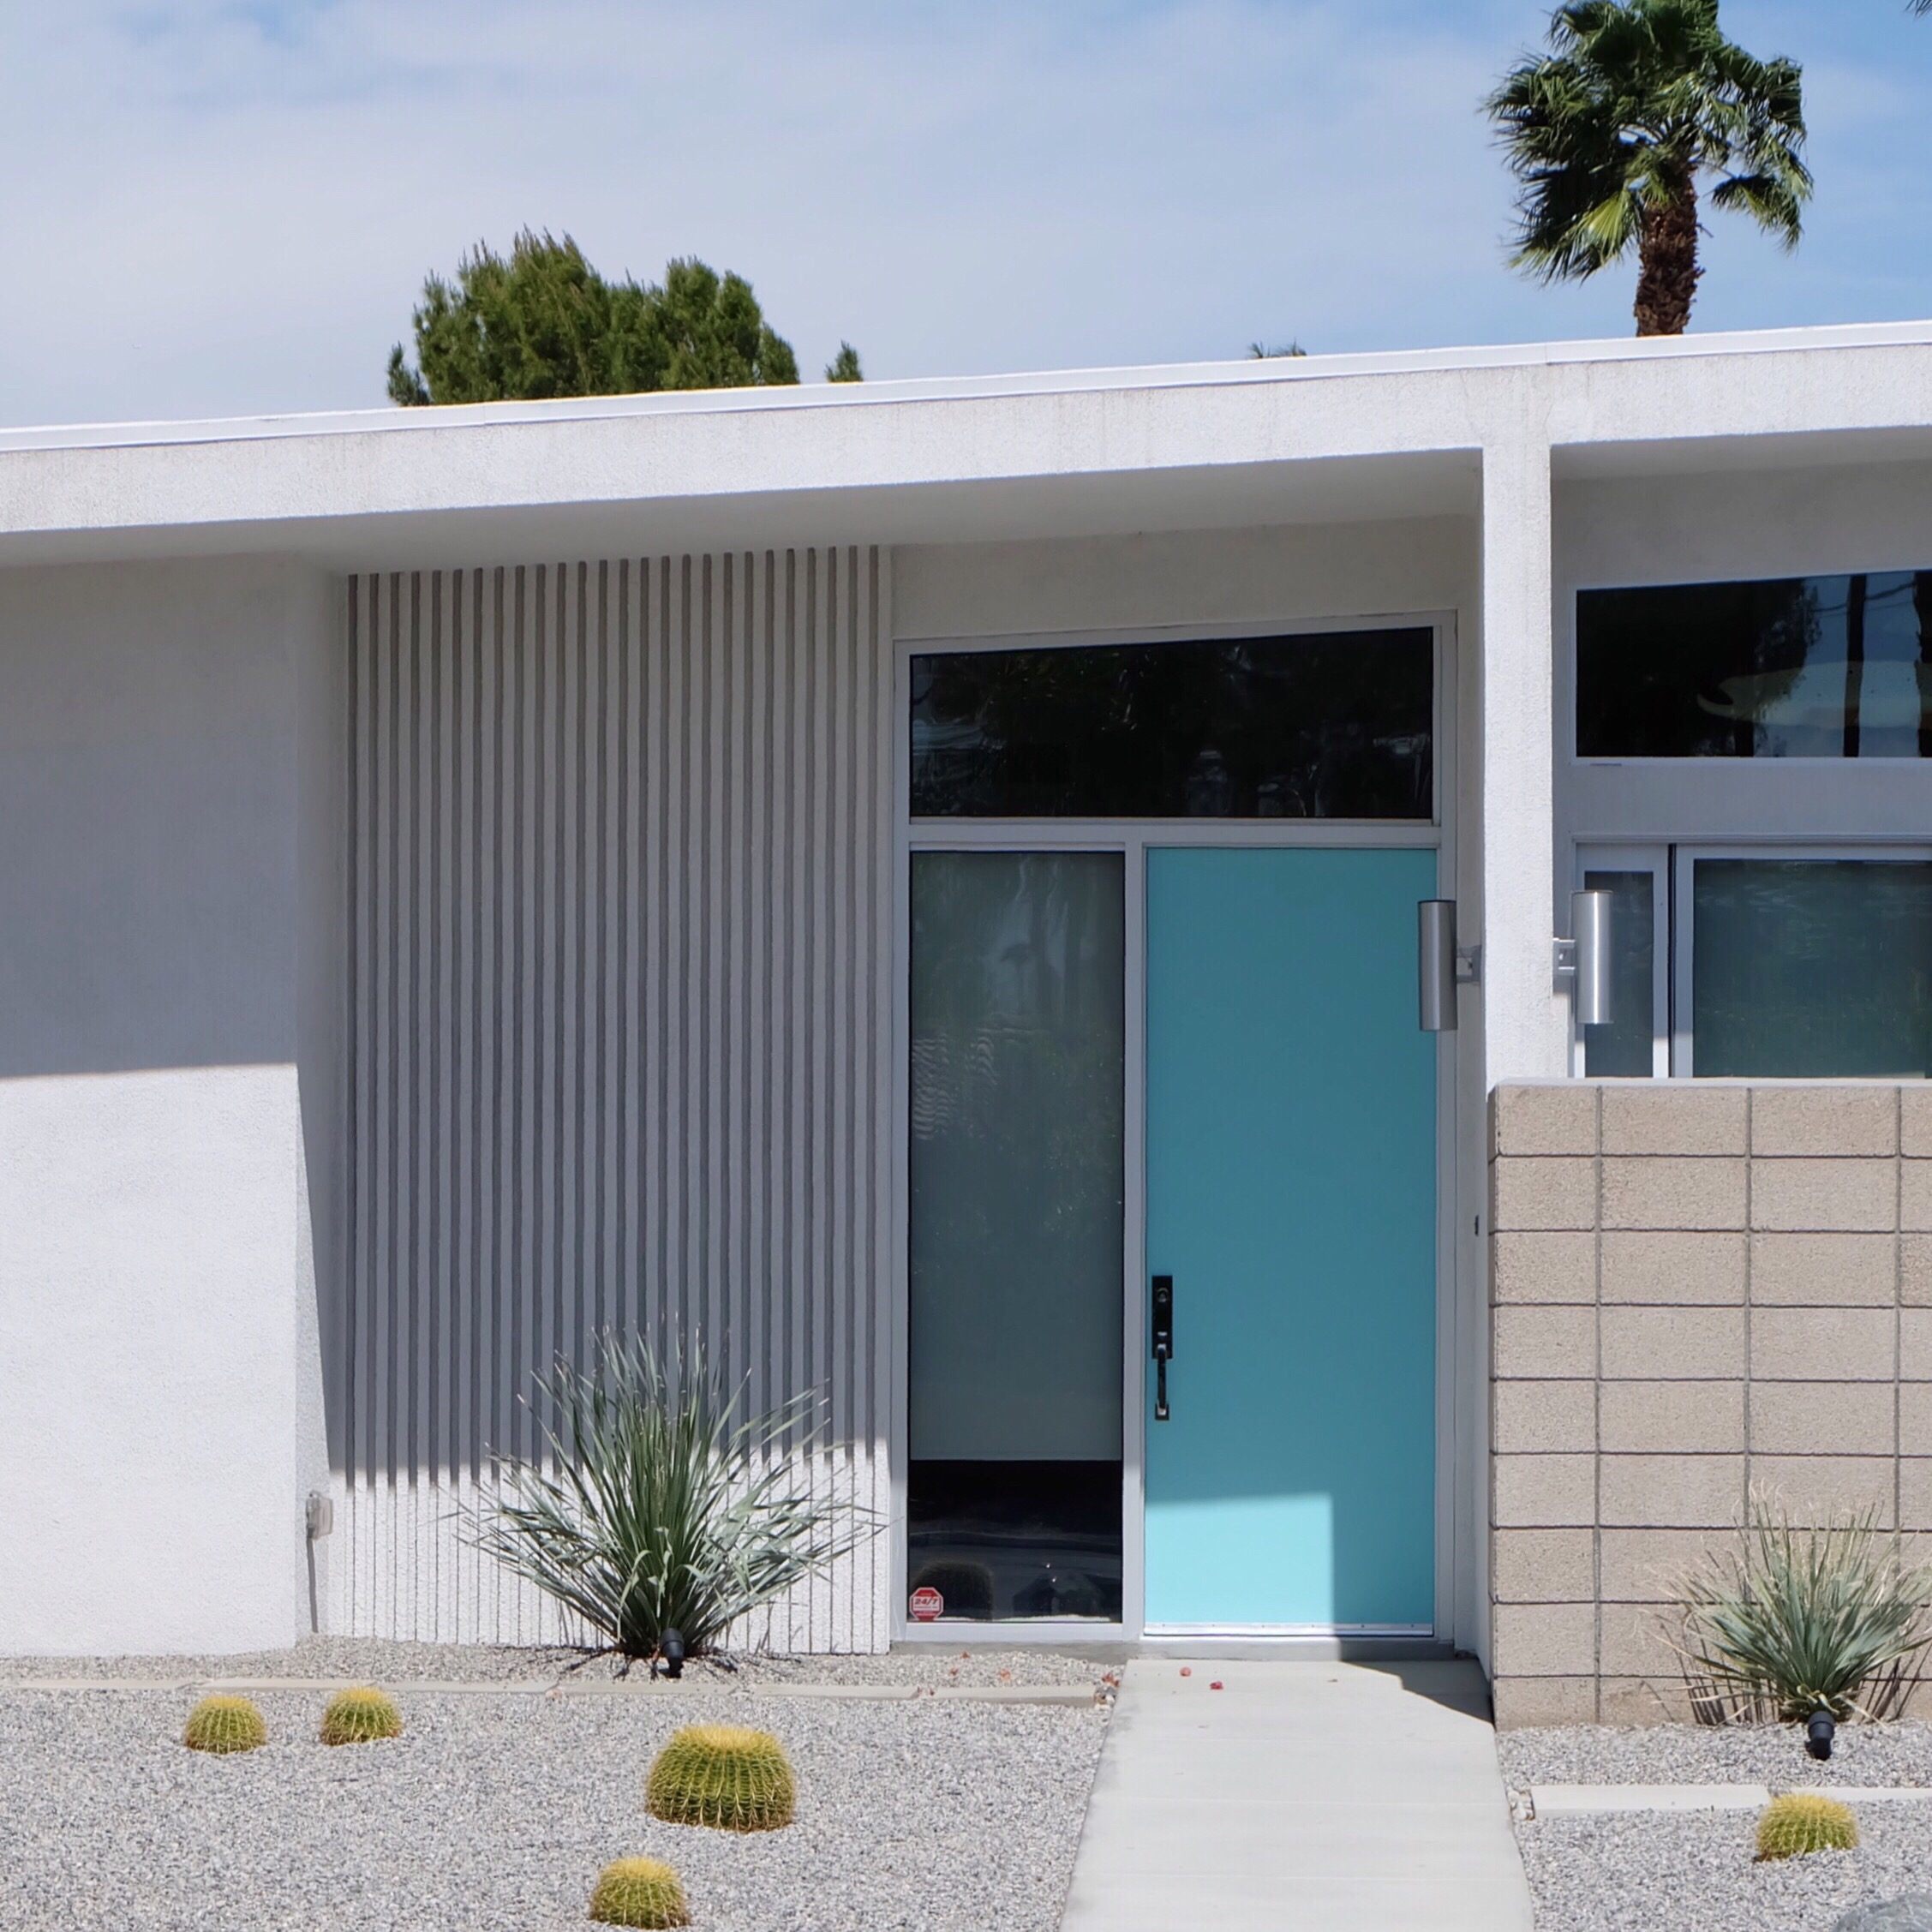 #Houseplants #minimal #retro #architecture #midcentury #tiffanyblue